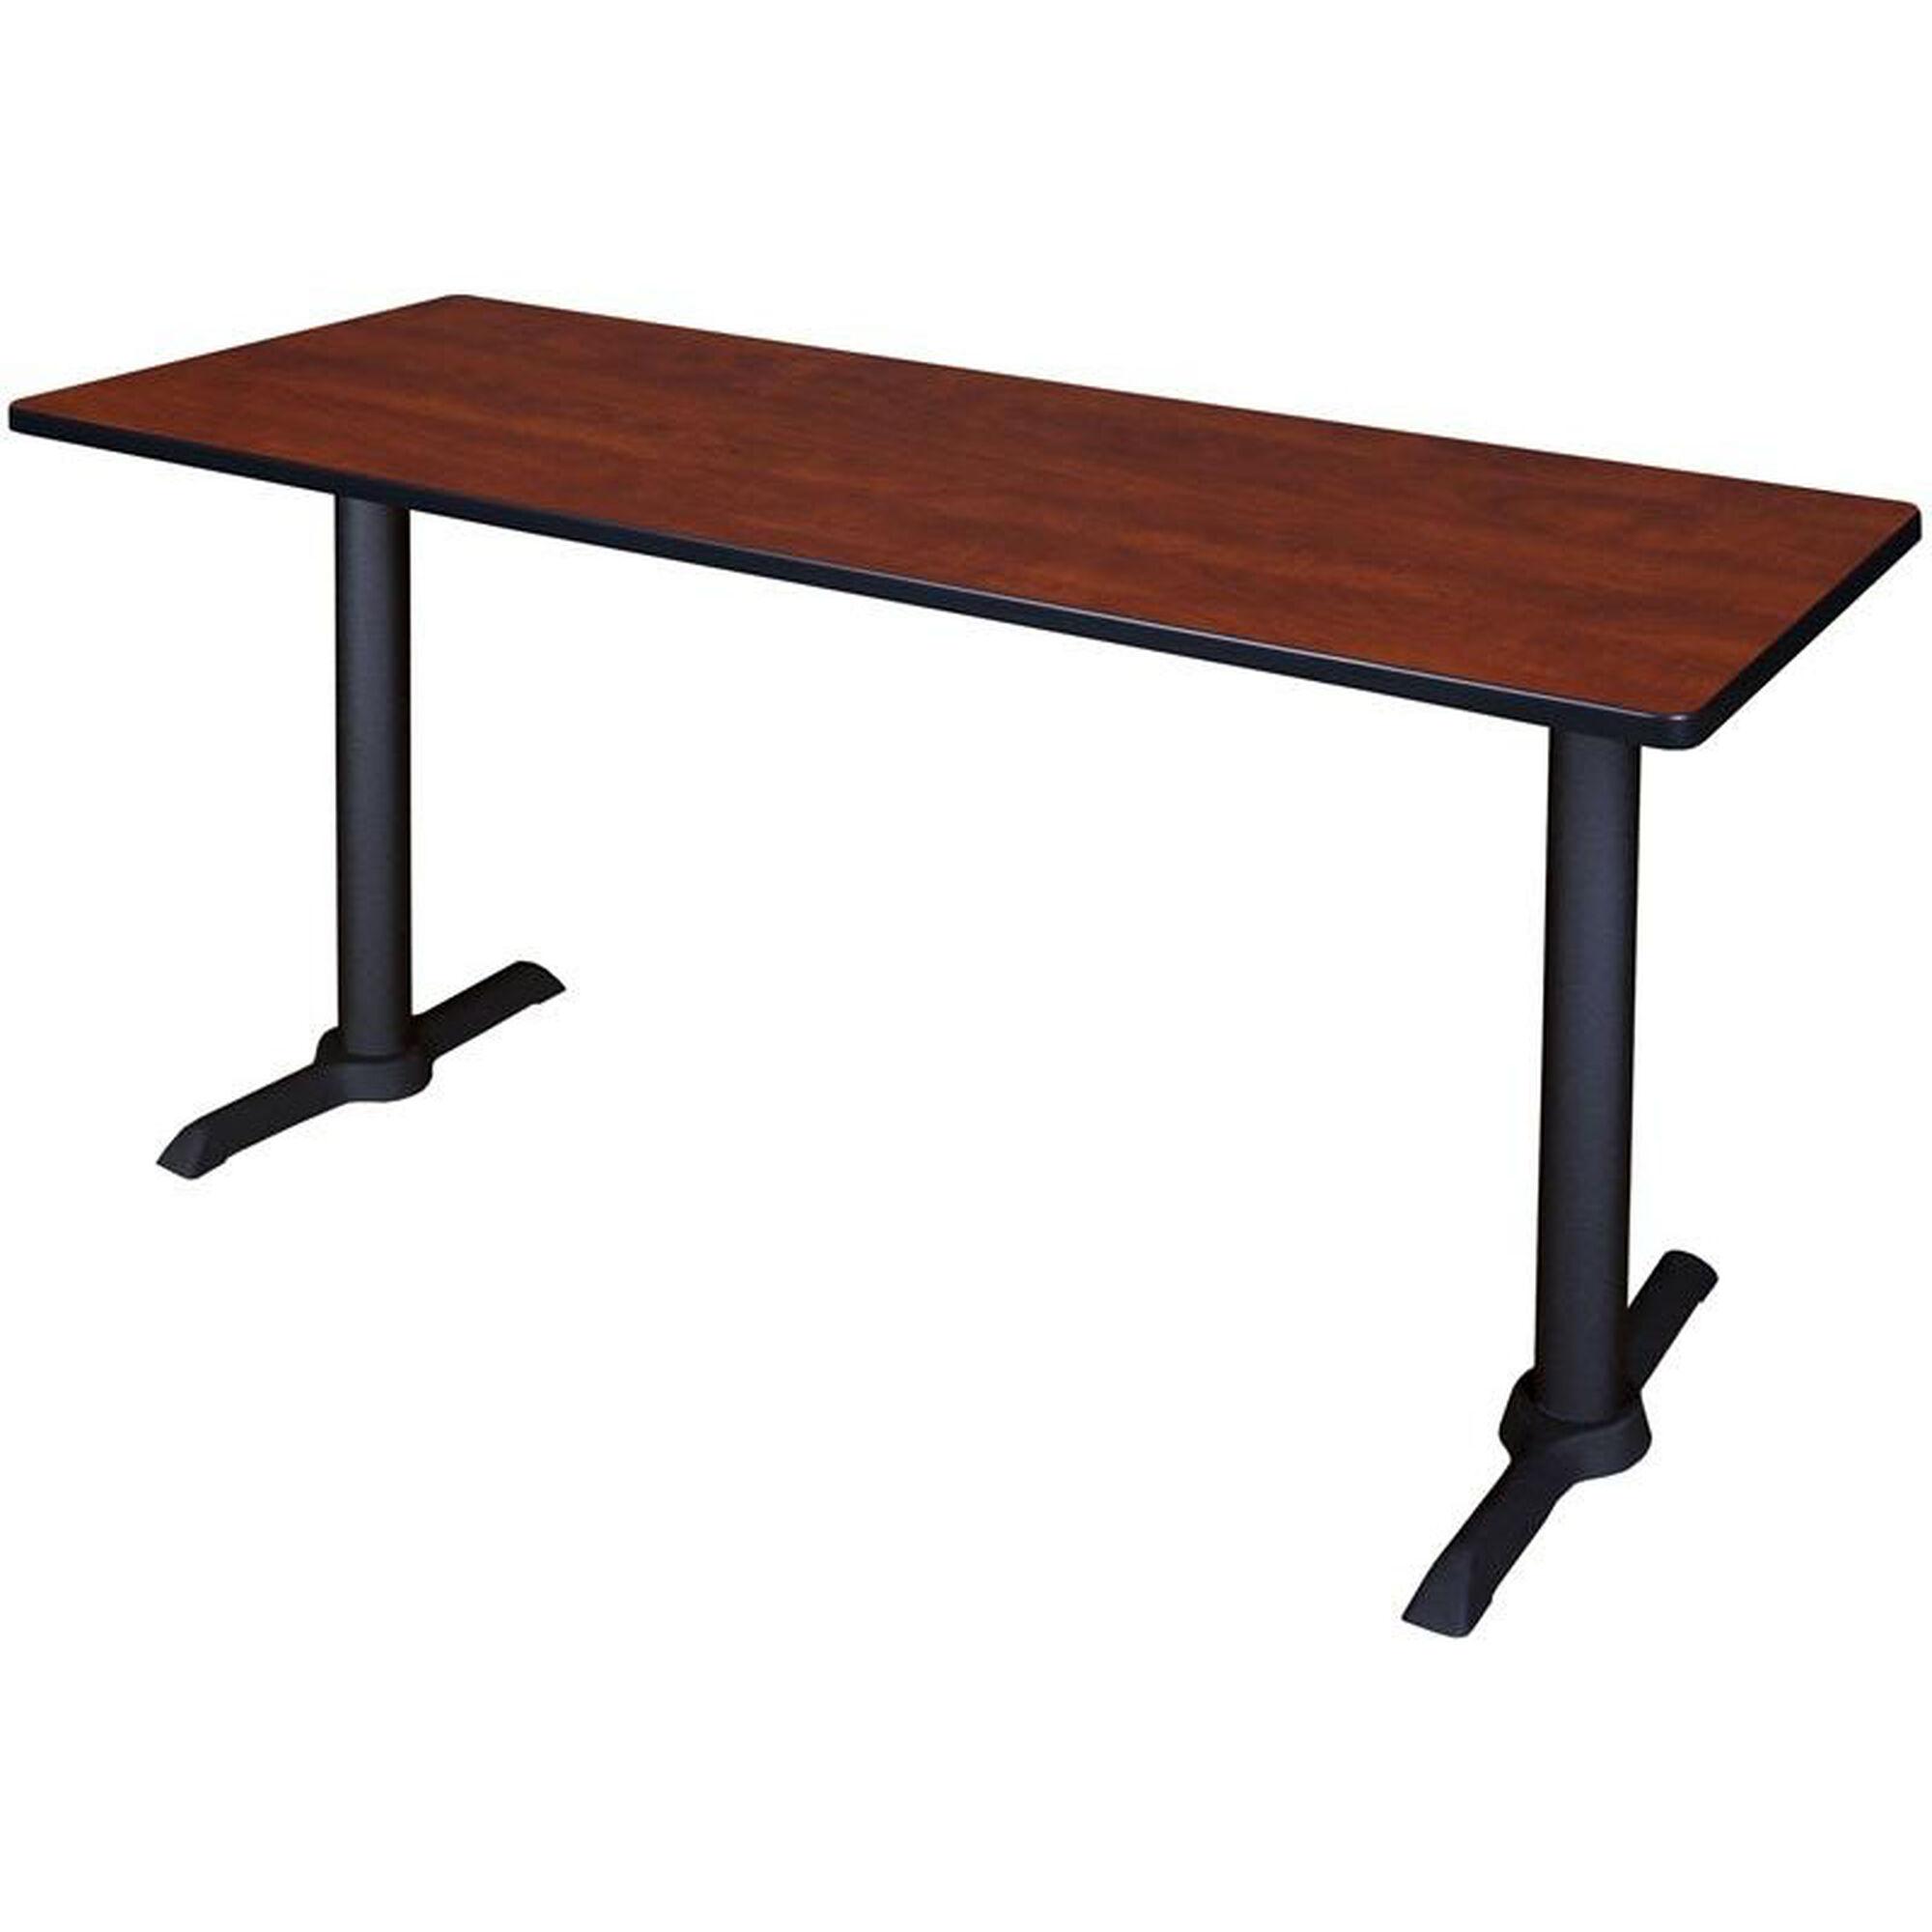 Cain 60''W x 24''D Laminate Training Table with PVC Edge - Cherry